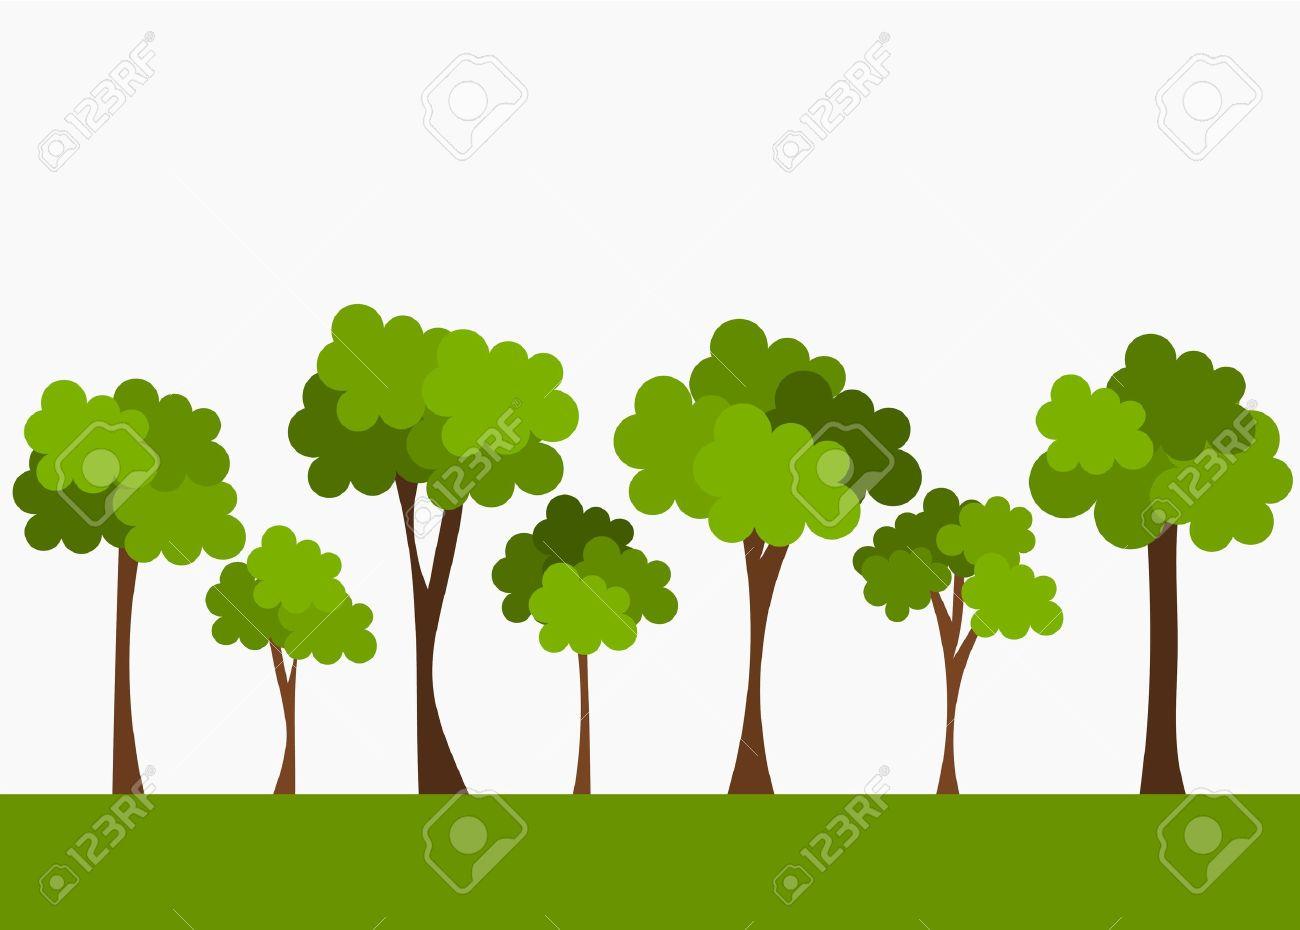 trees vector illustration royalty free cliparts vectors and stock rh 123rf com tree vector silhouette tree vector silhouette